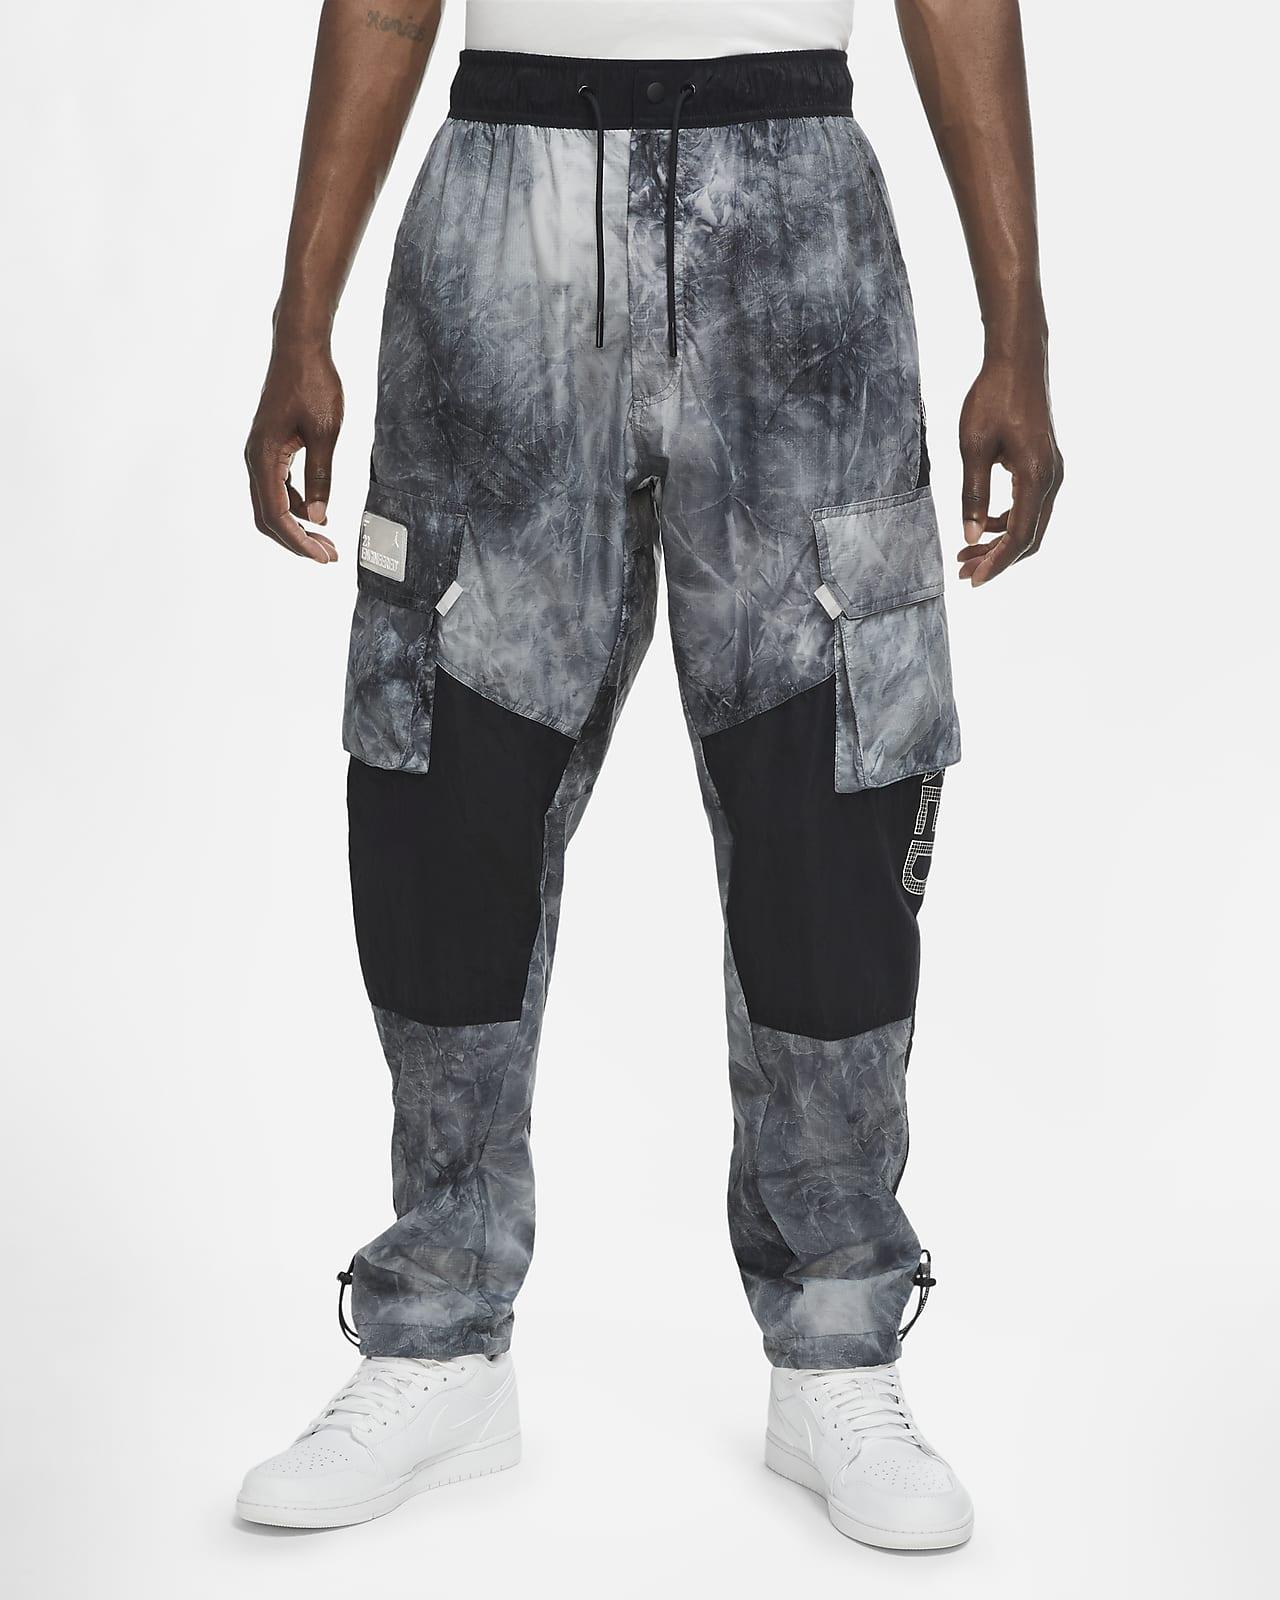 Jordan 23 Engineered Men's Printed Cargo Pants